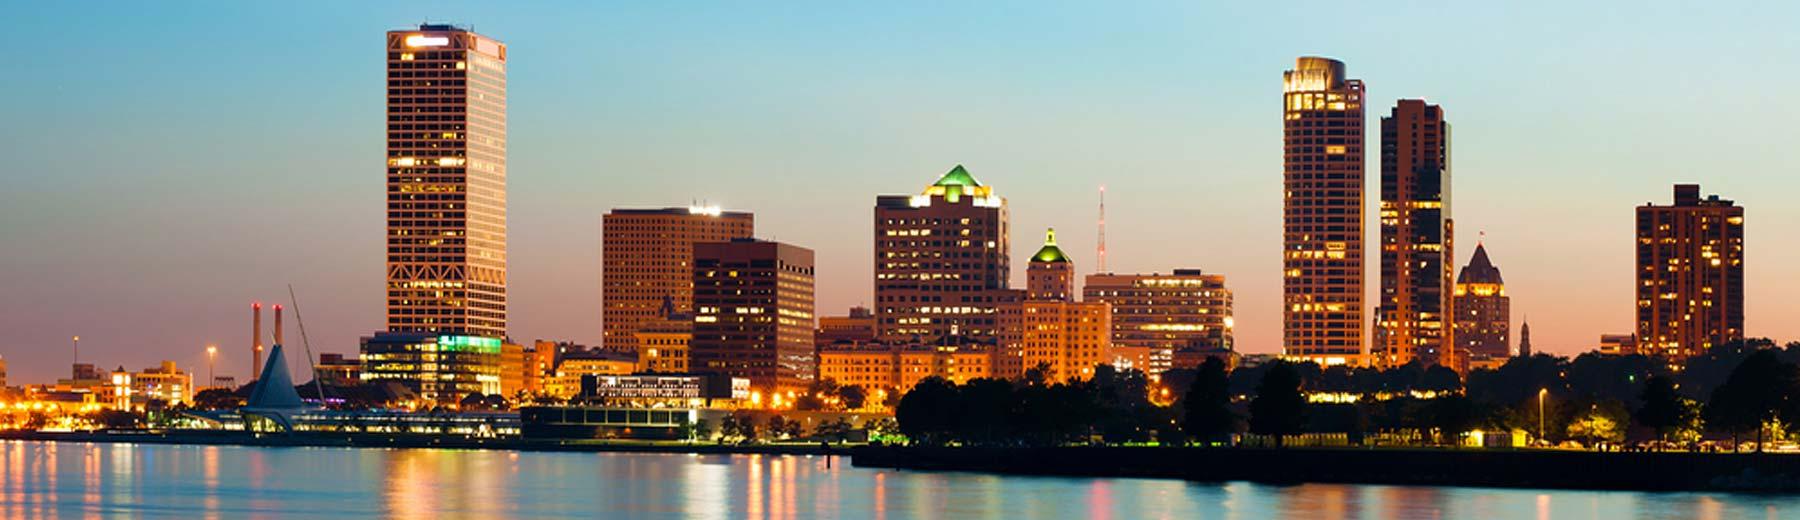 cityscape-lauenstein-associates-commercial-appraisal